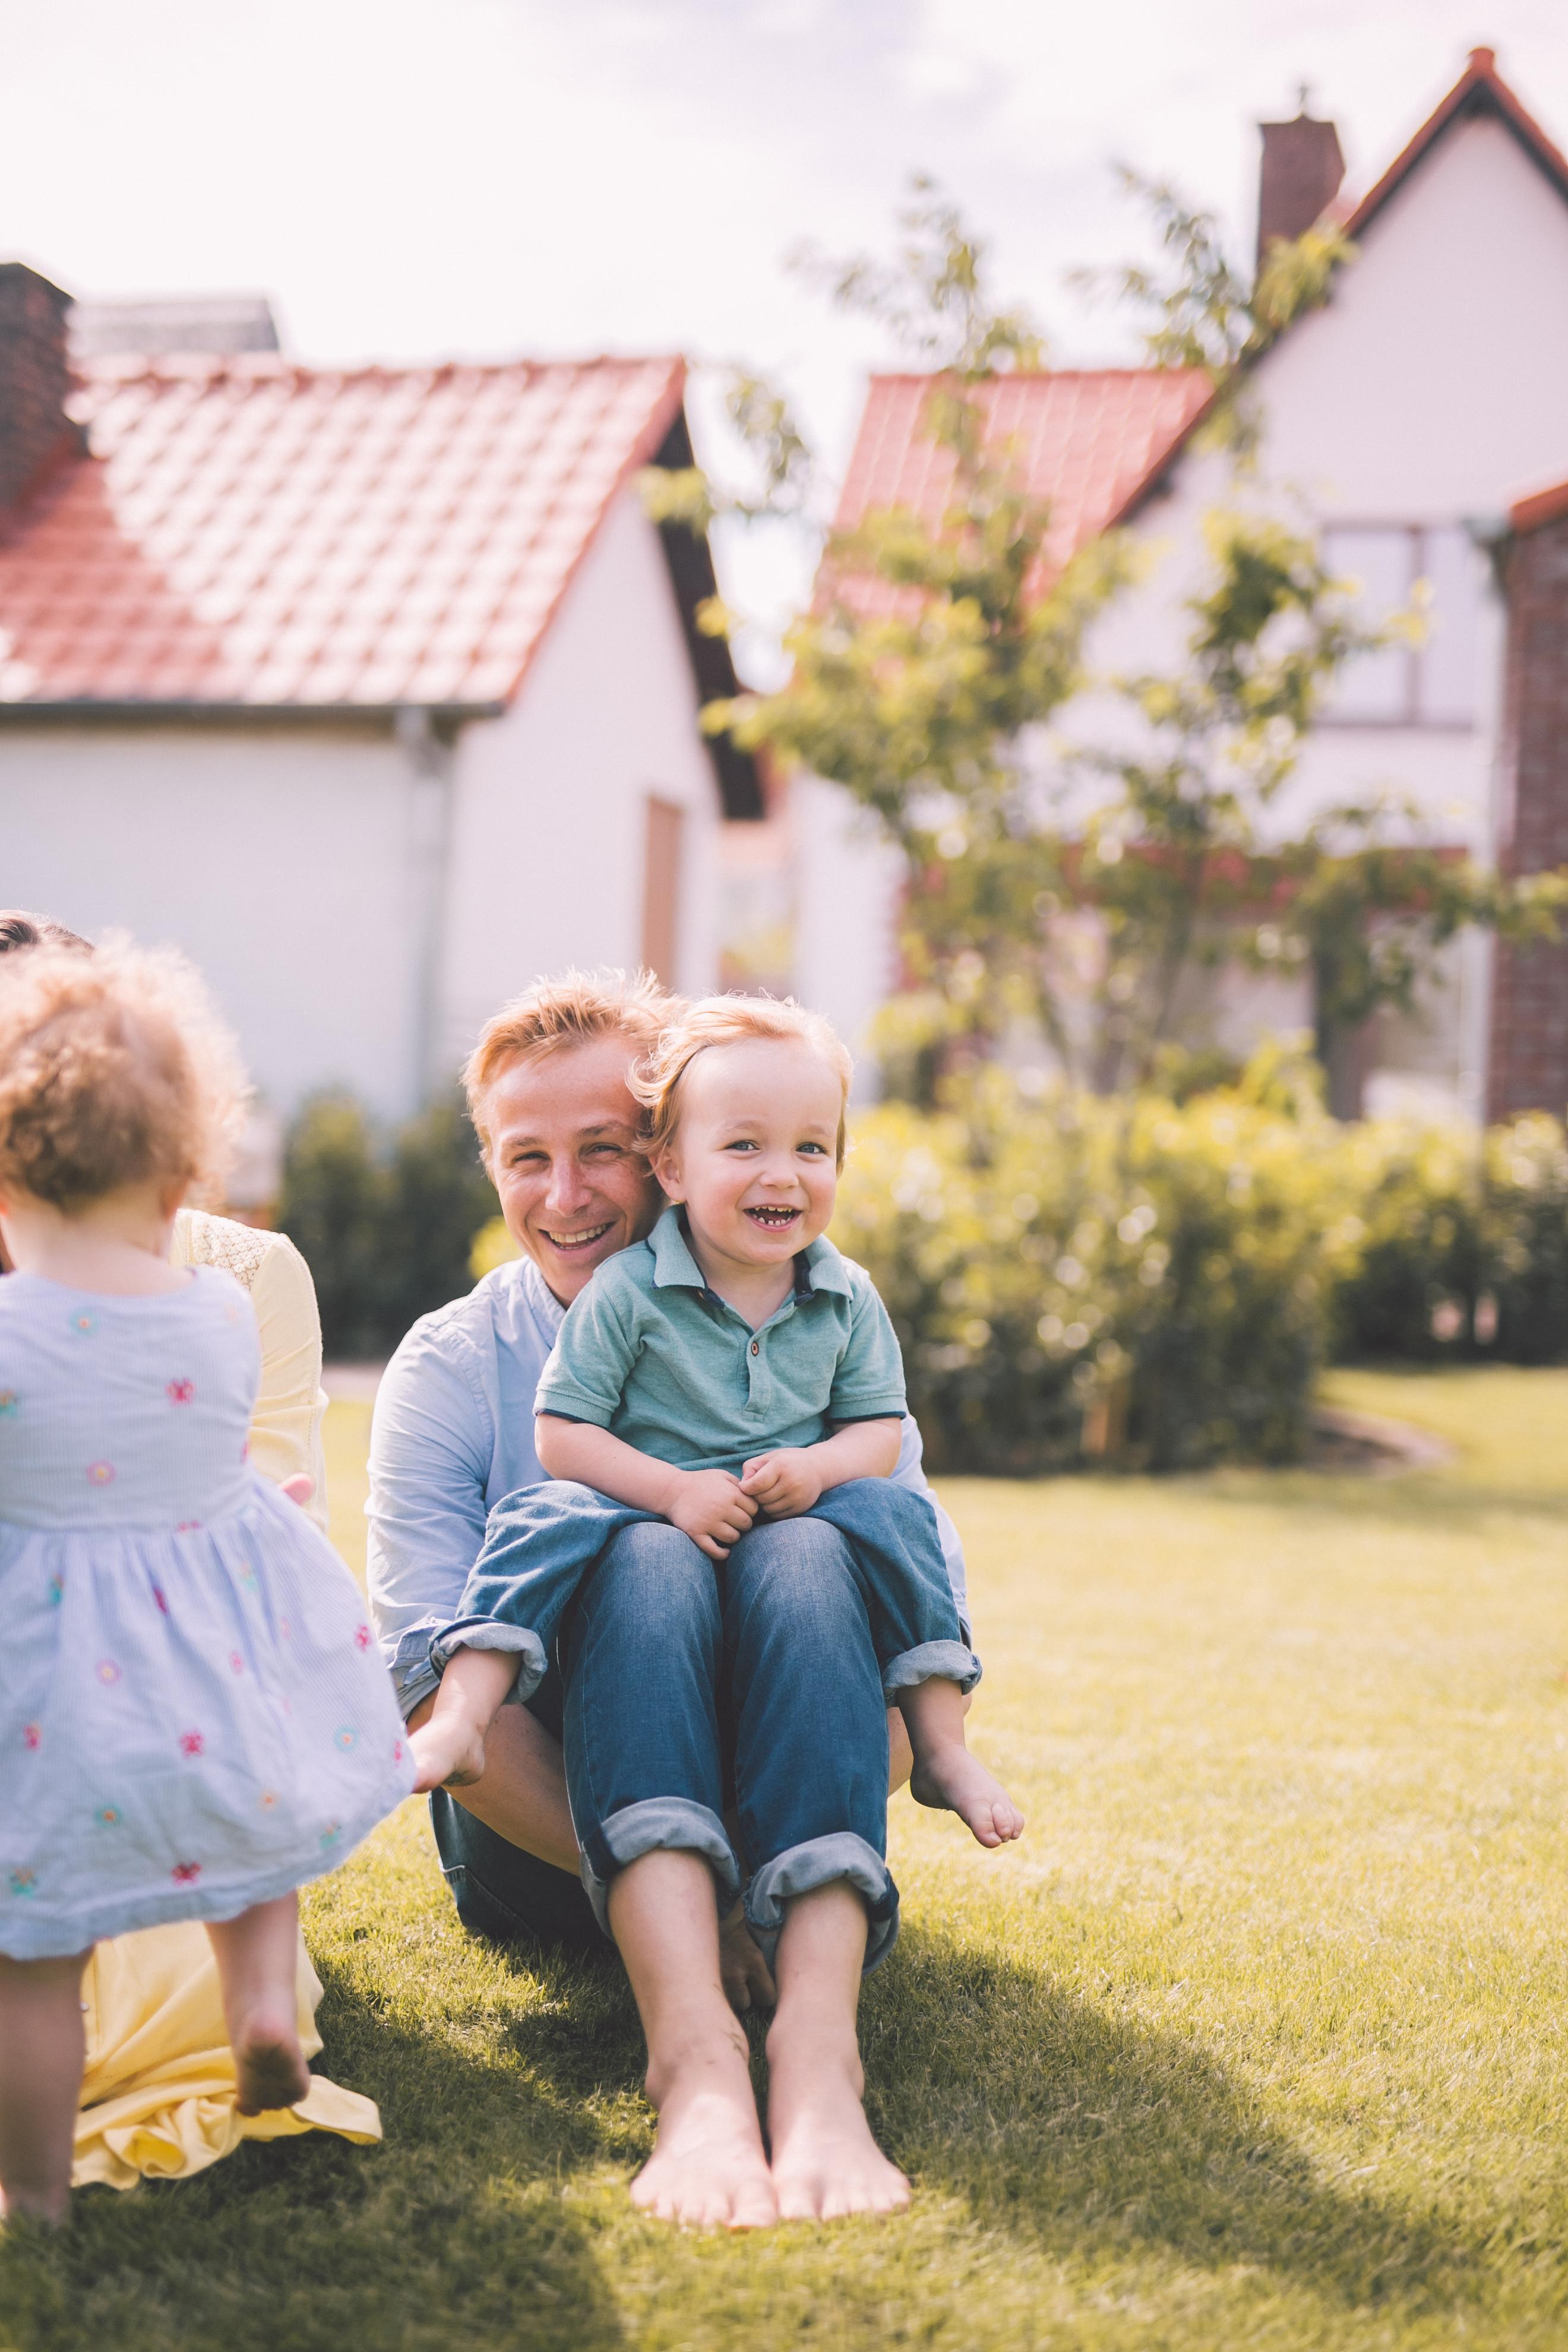 FAMILIE DE MULDER-4913